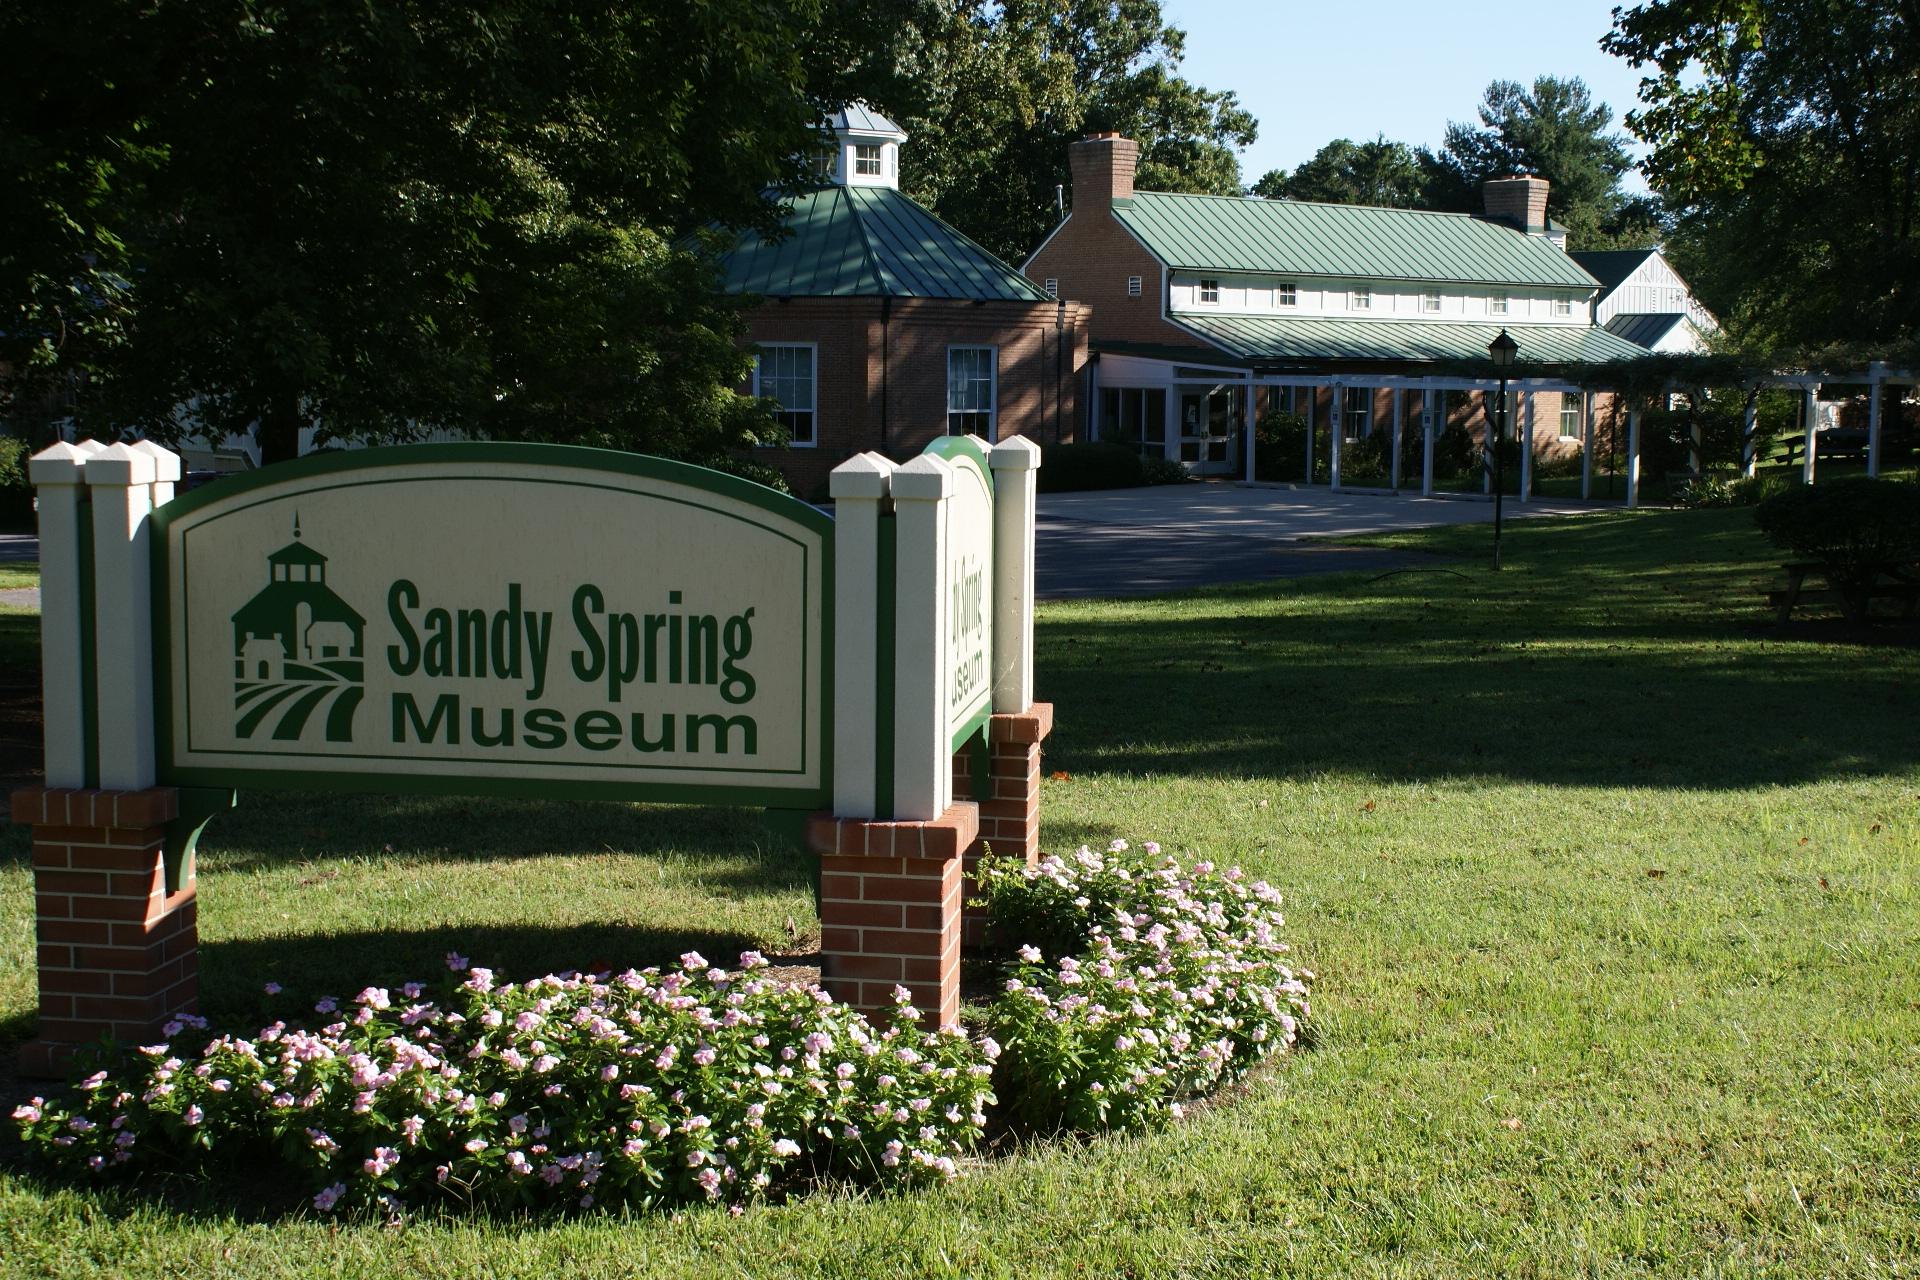 Sandy Spring map